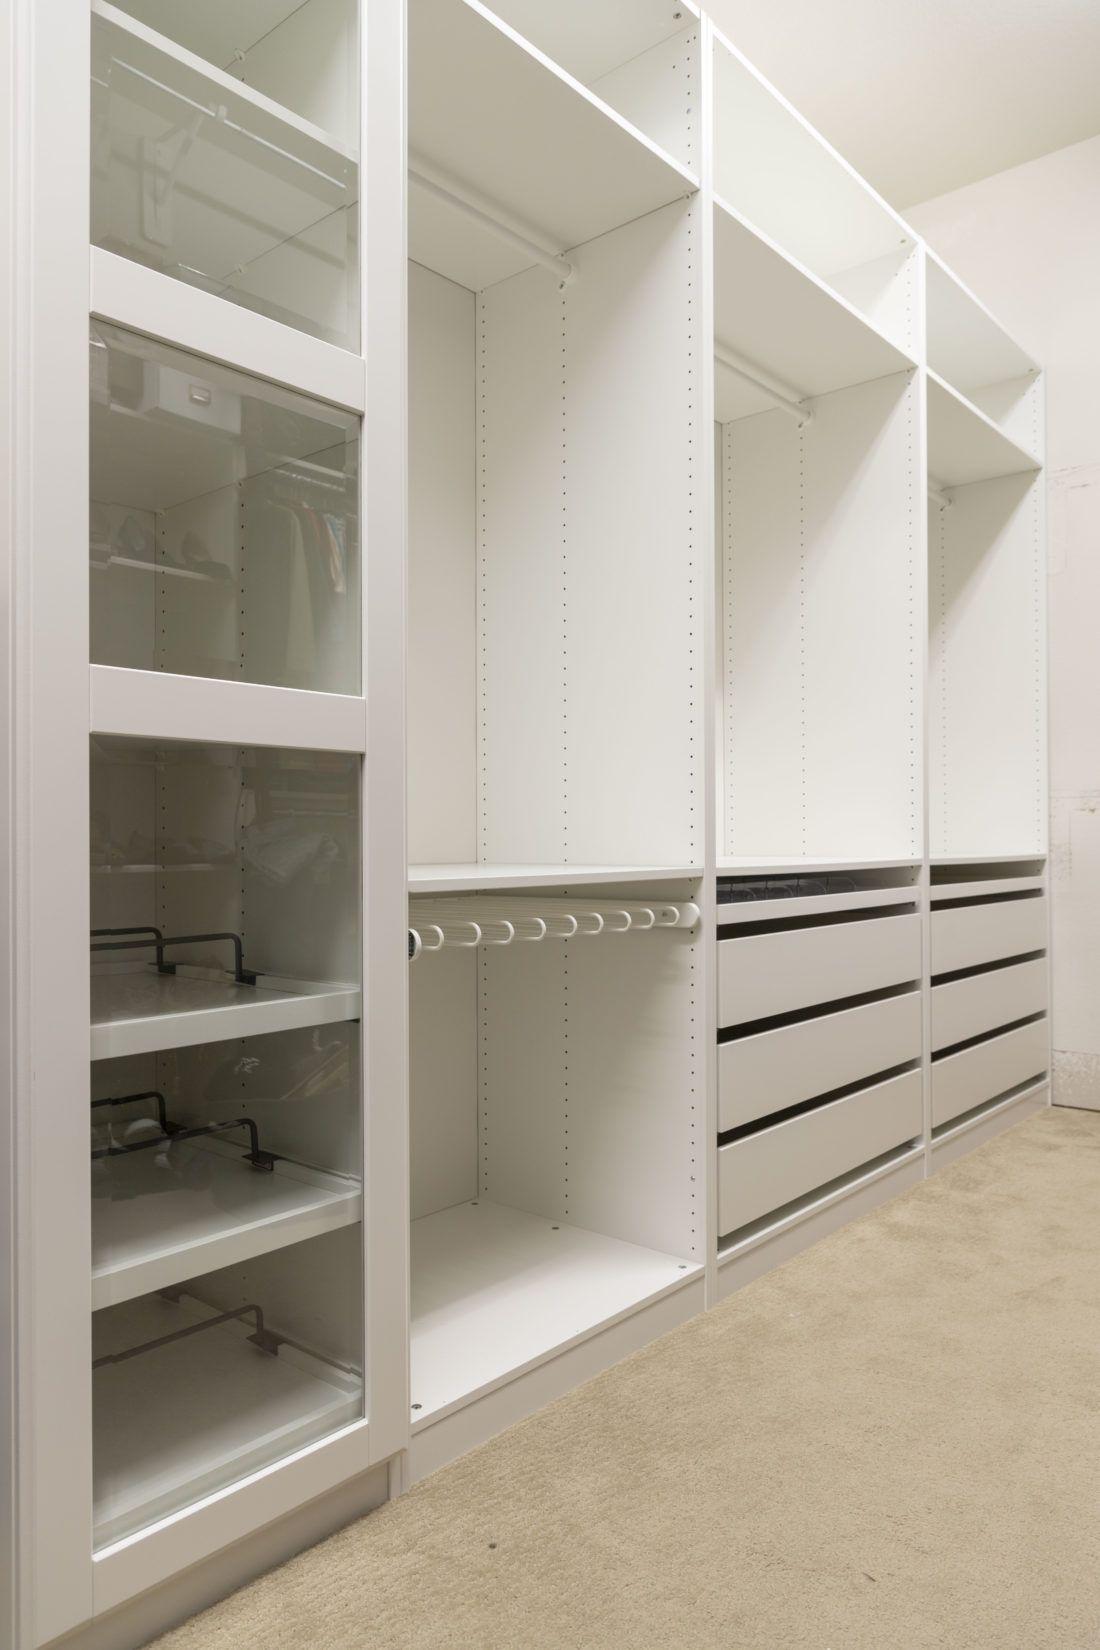 IKEA Closet Progress - Crazy Wonderful